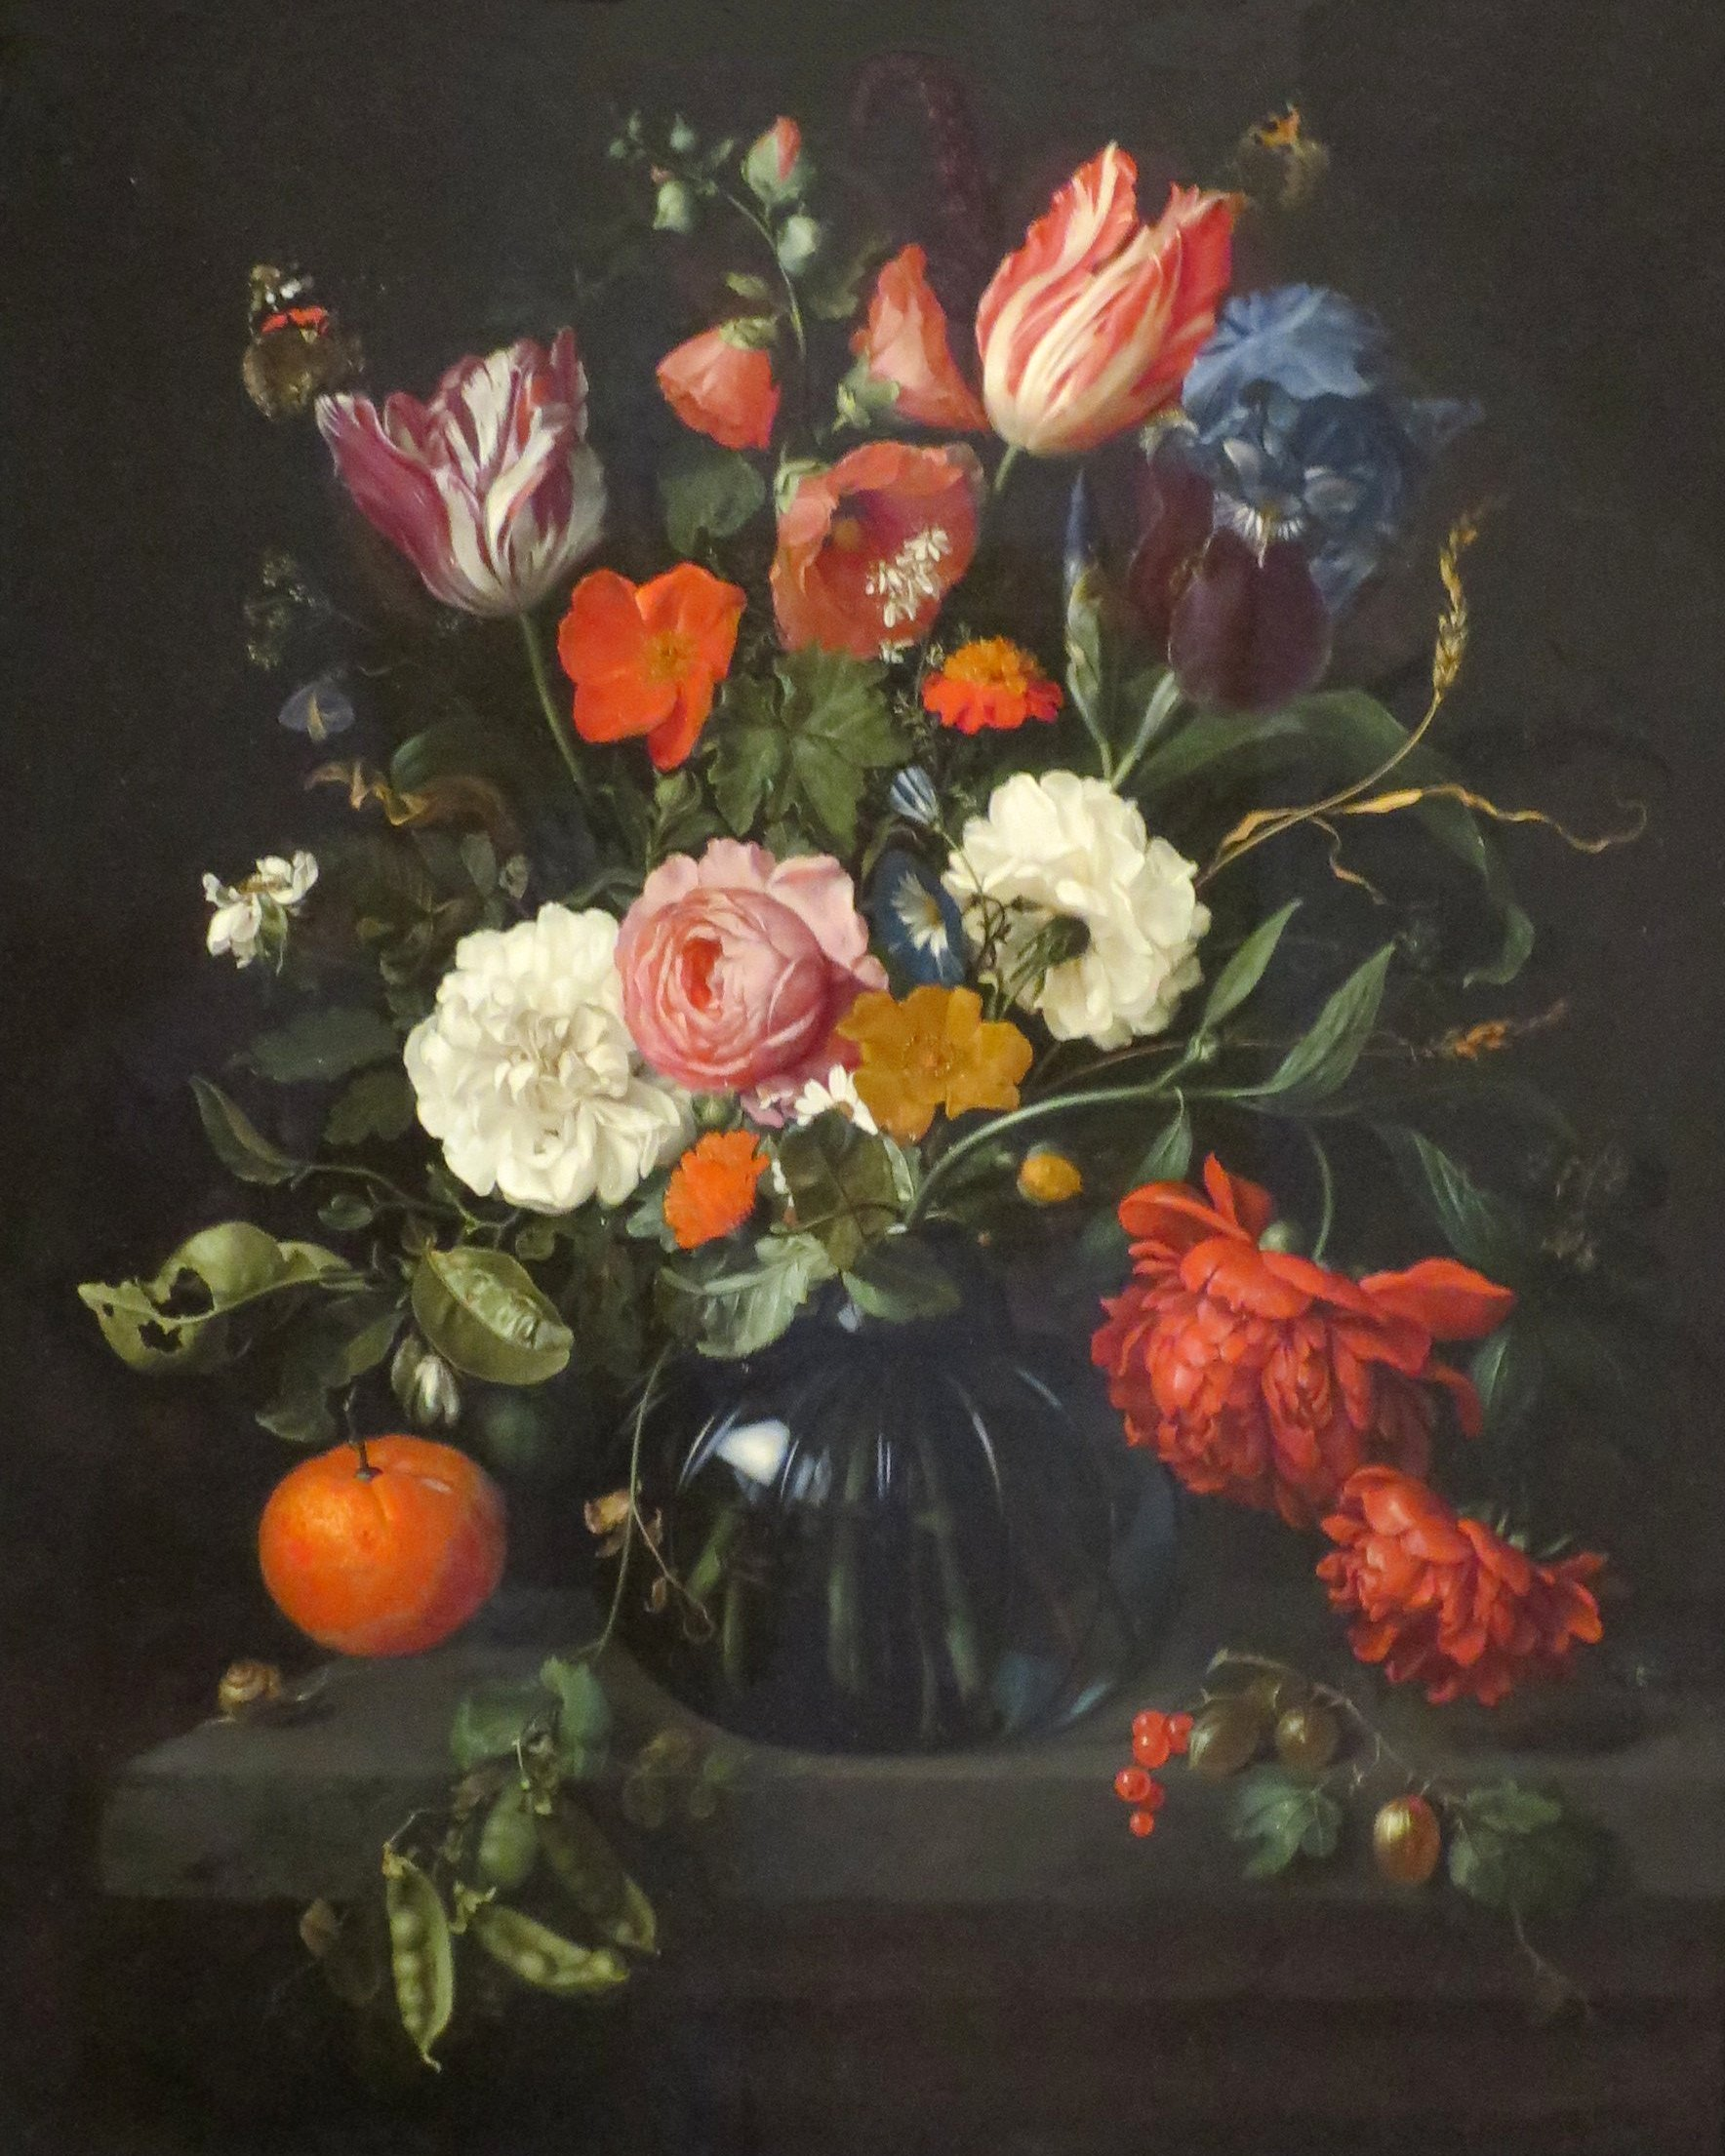 File Vase Of Flowers By Jan Davidsz De Heem 1654 Norton Simon Museum Jpg Wikimedia Commons